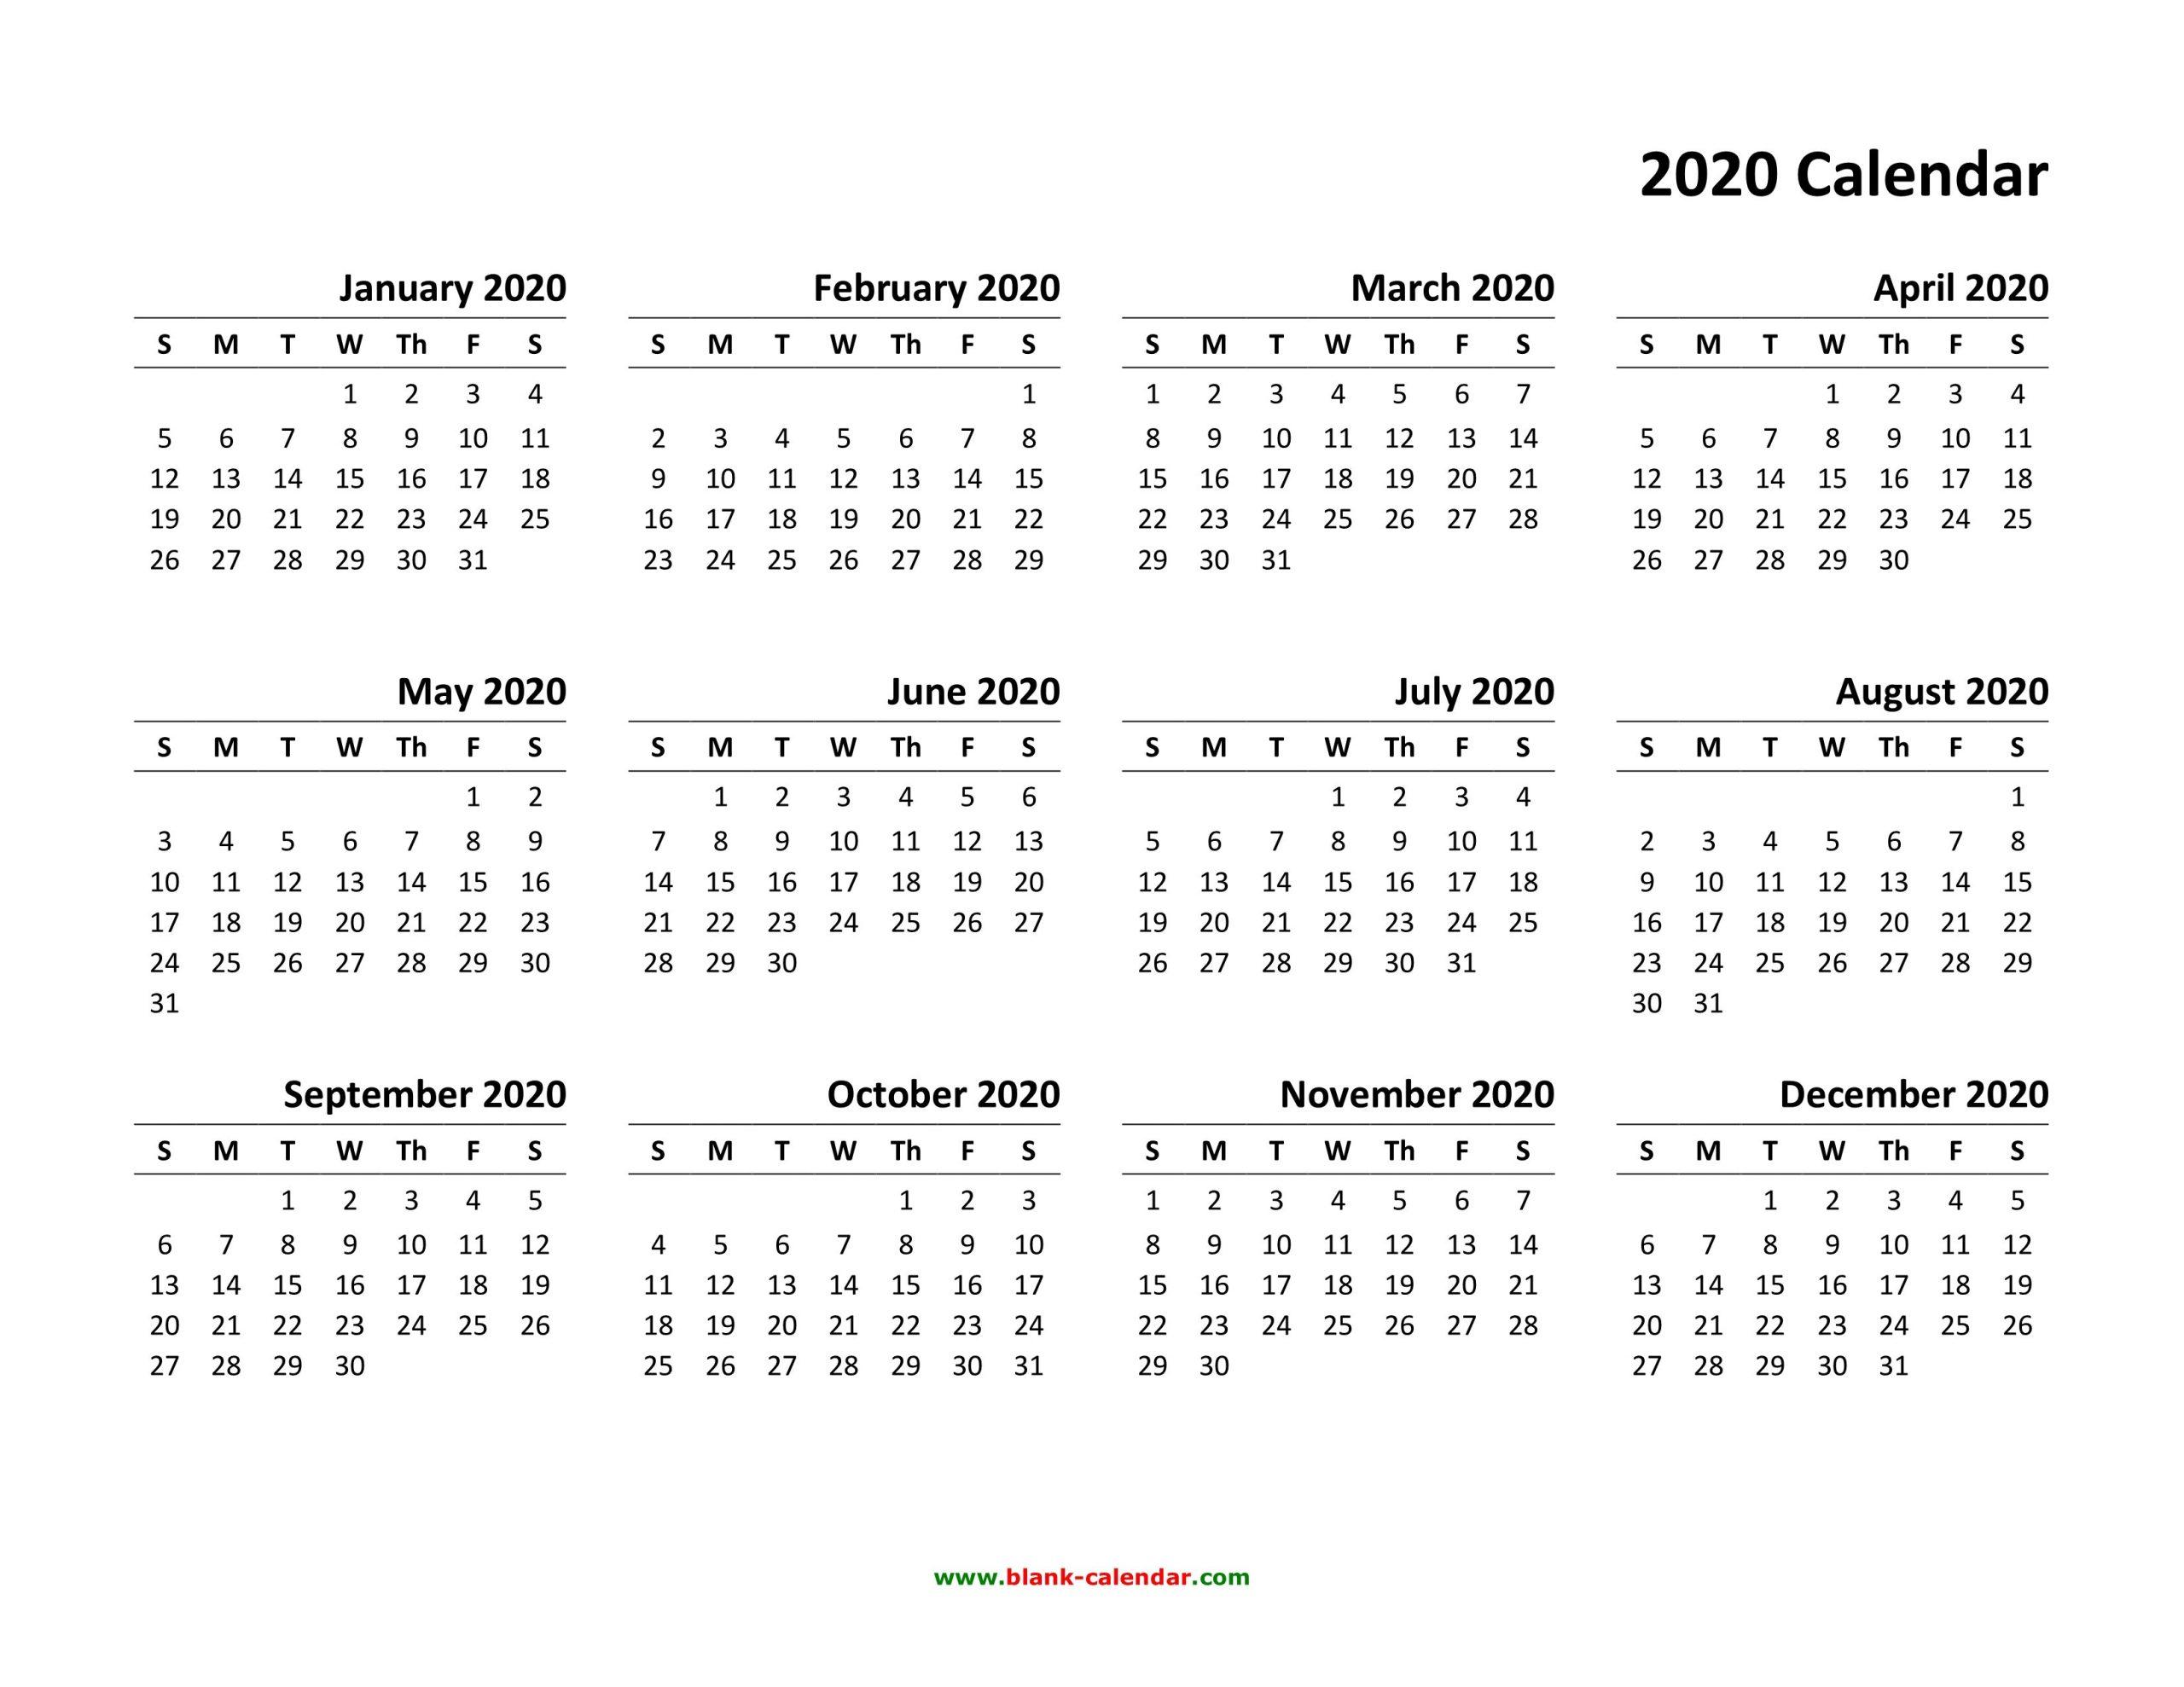 Free Printable 2020 Calendar To I Can Edit   Calendar Printable Calendar I Can Edit